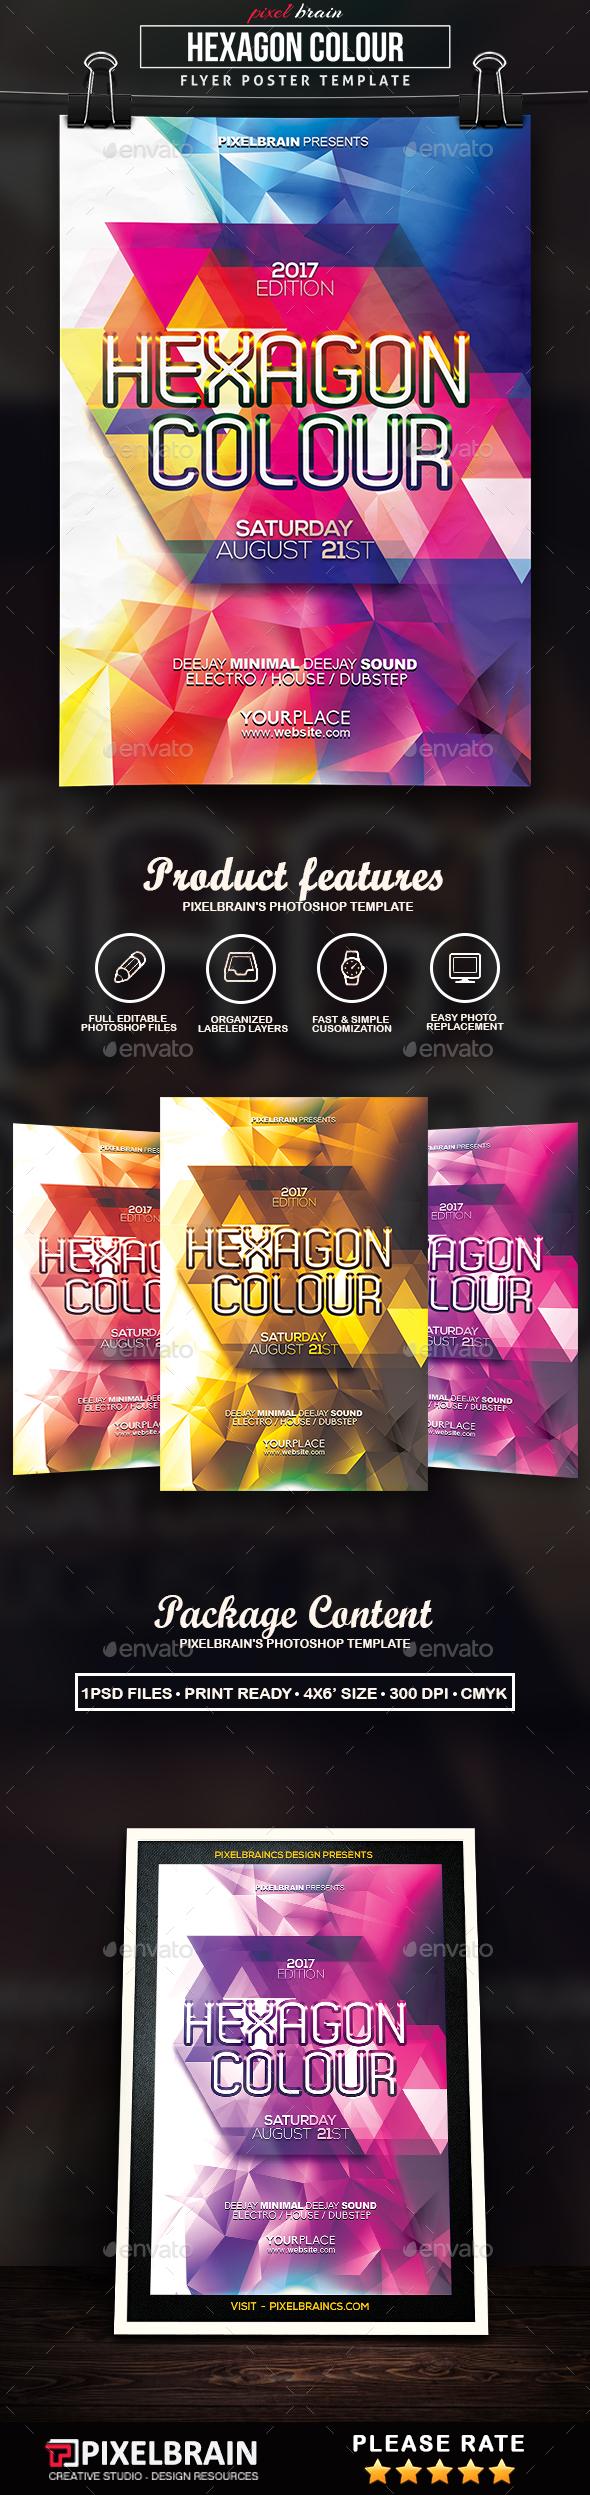 Hexagon Colour Flyer Template - Events Flyers